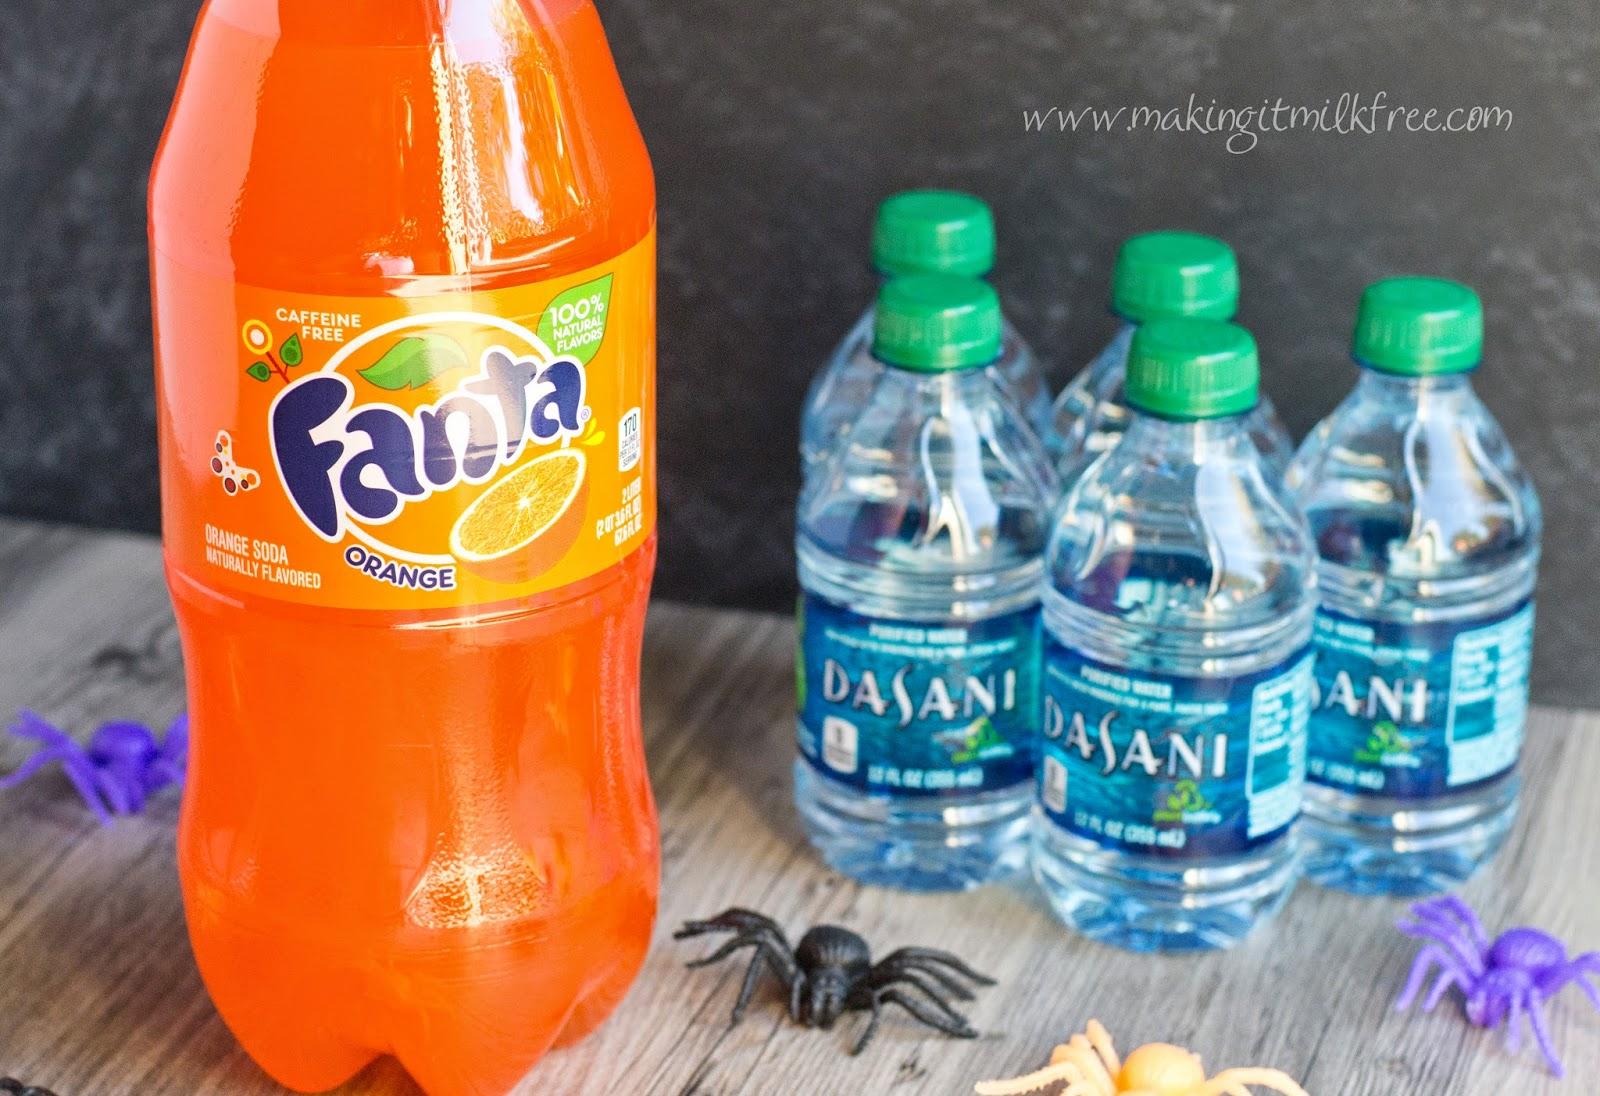 #halloweensnacks #dasani #fanta